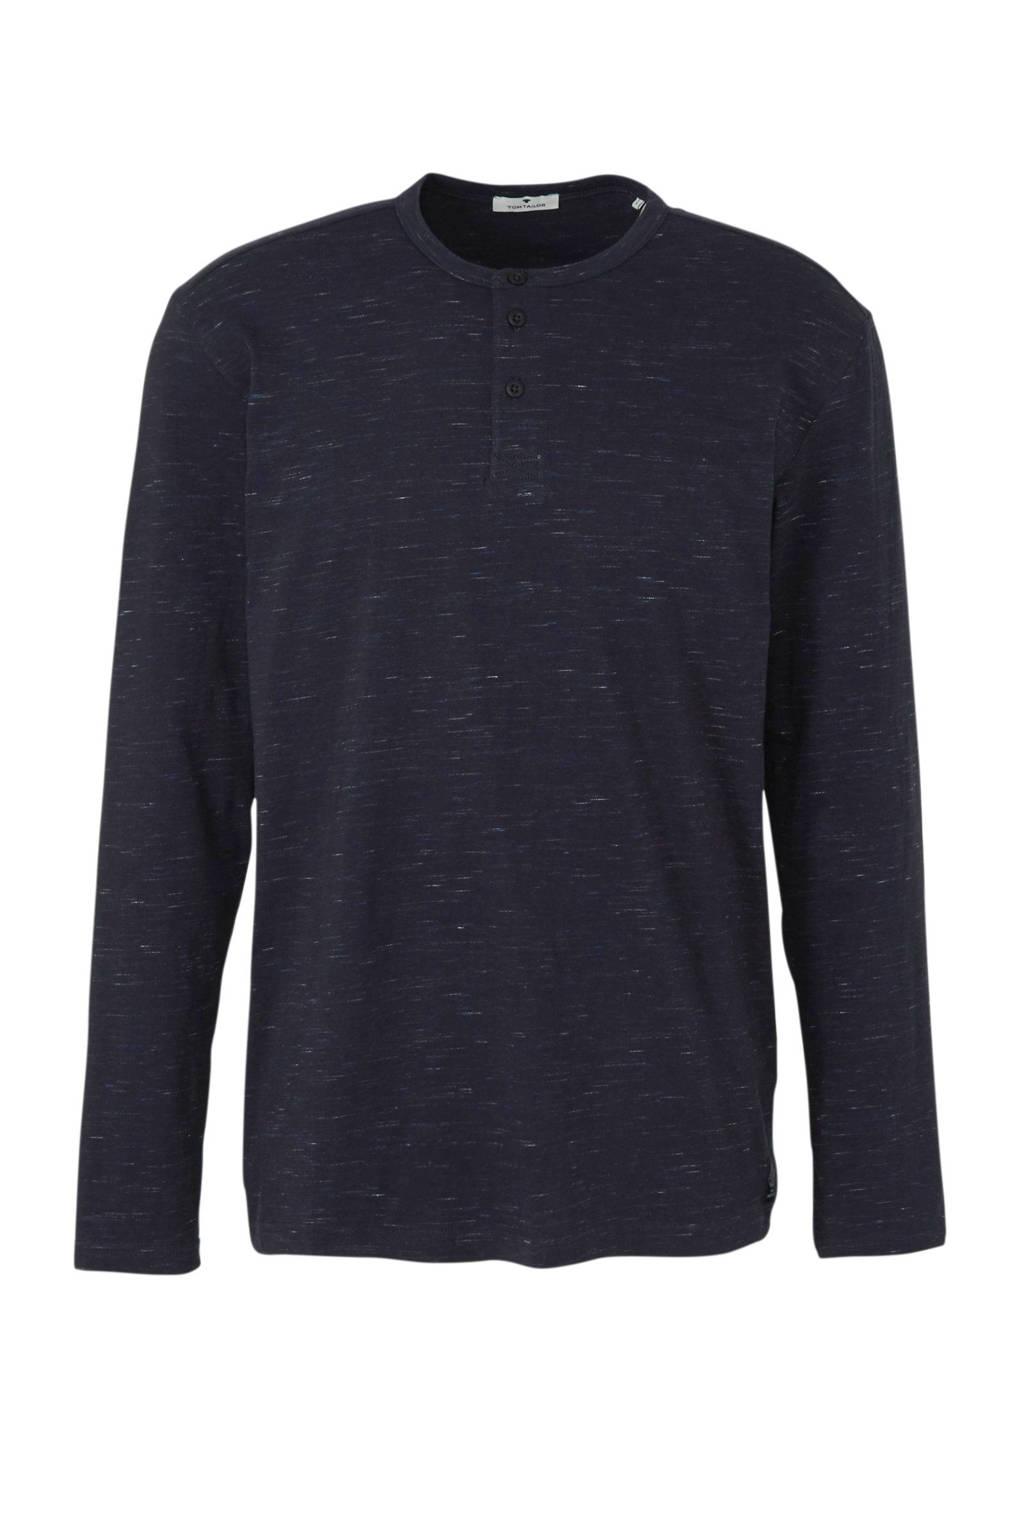 Tom Tailor gemêleerd T-shirt donkerblauw/wit, Donkerblauw